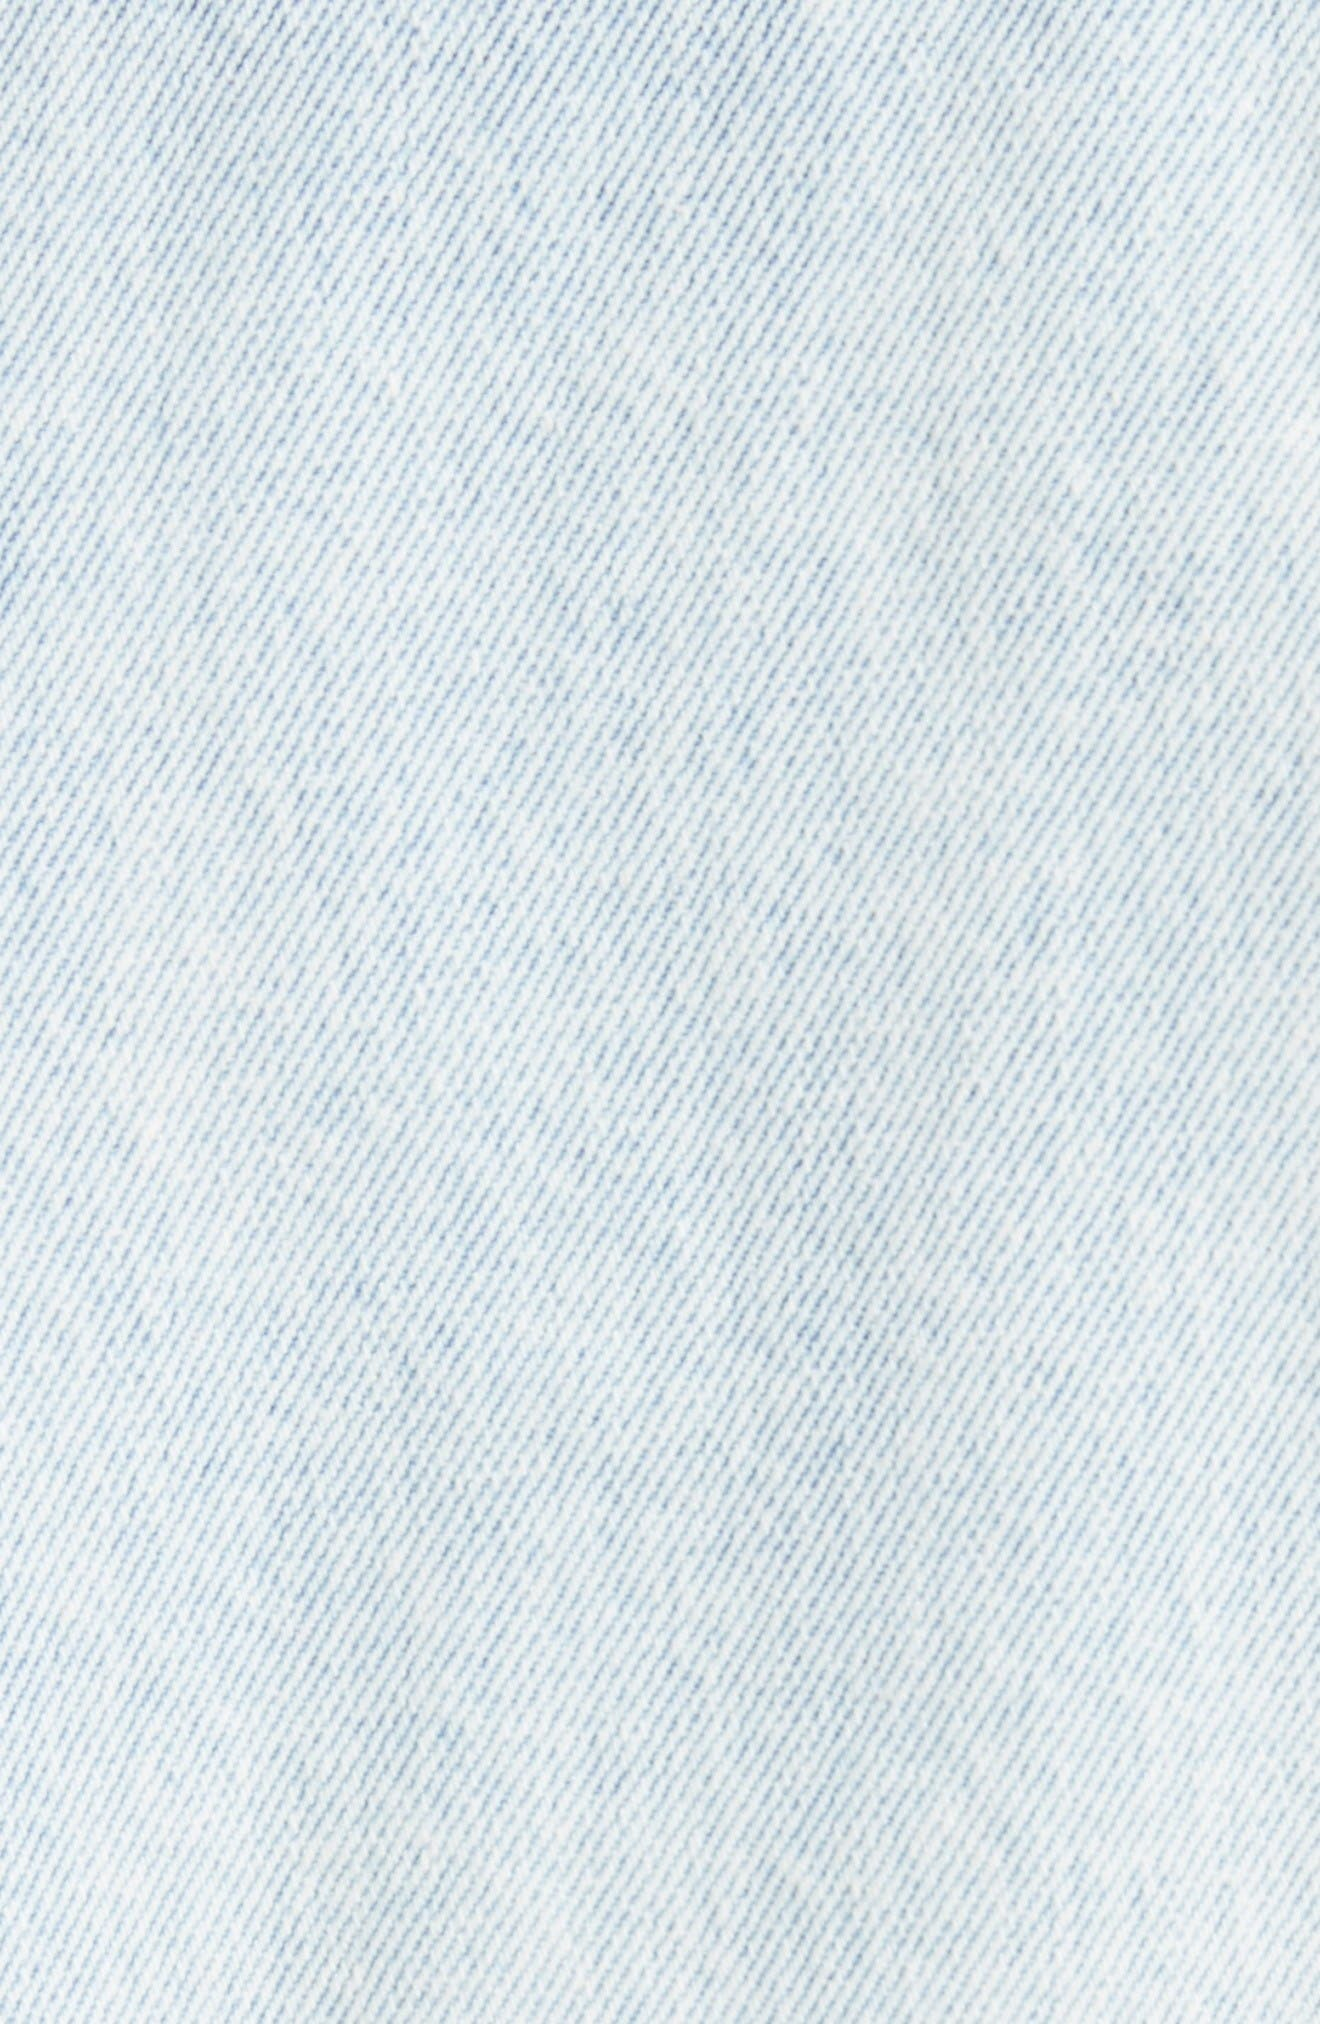 Zipper Detail Denim Jacket,                             Alternate thumbnail 5, color,                             Indigo